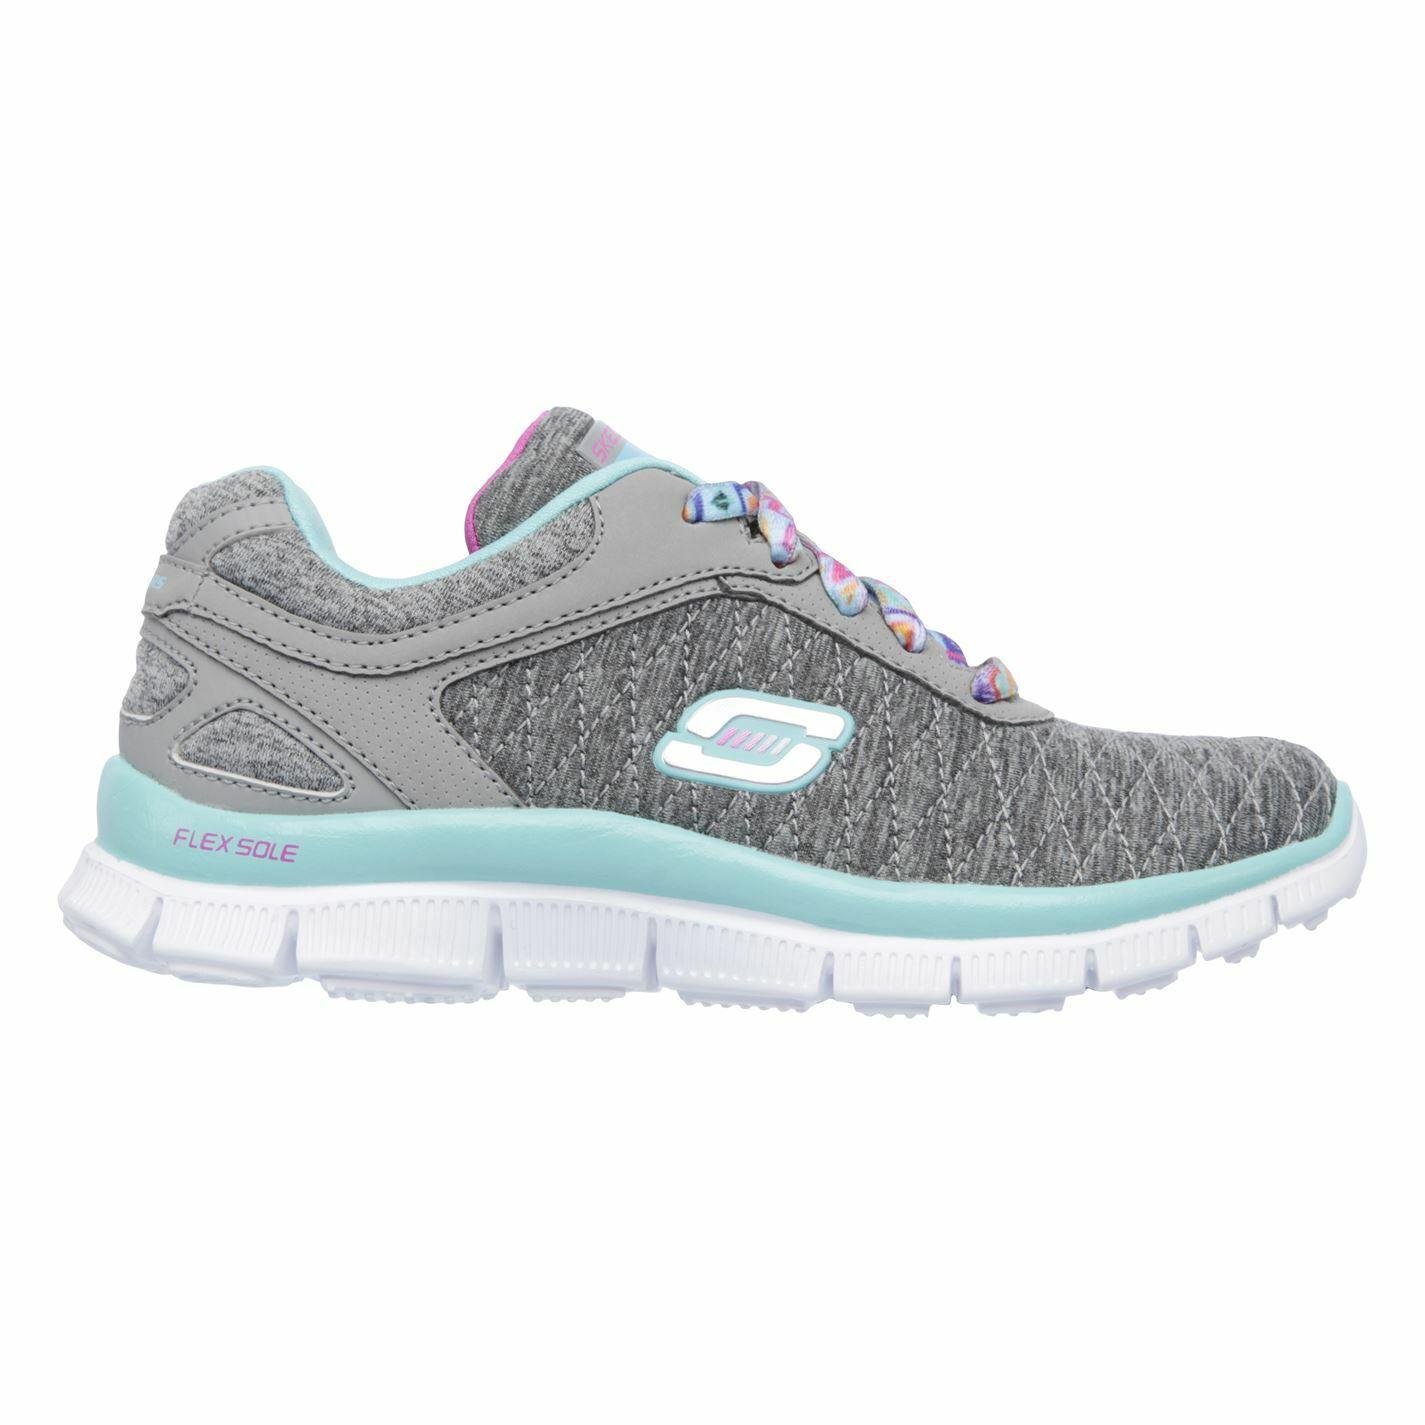 Skechers Appeal EC  Youngster Girls zapatillas Runners zapatos Laces Fastened  Garantía 100% de ajuste